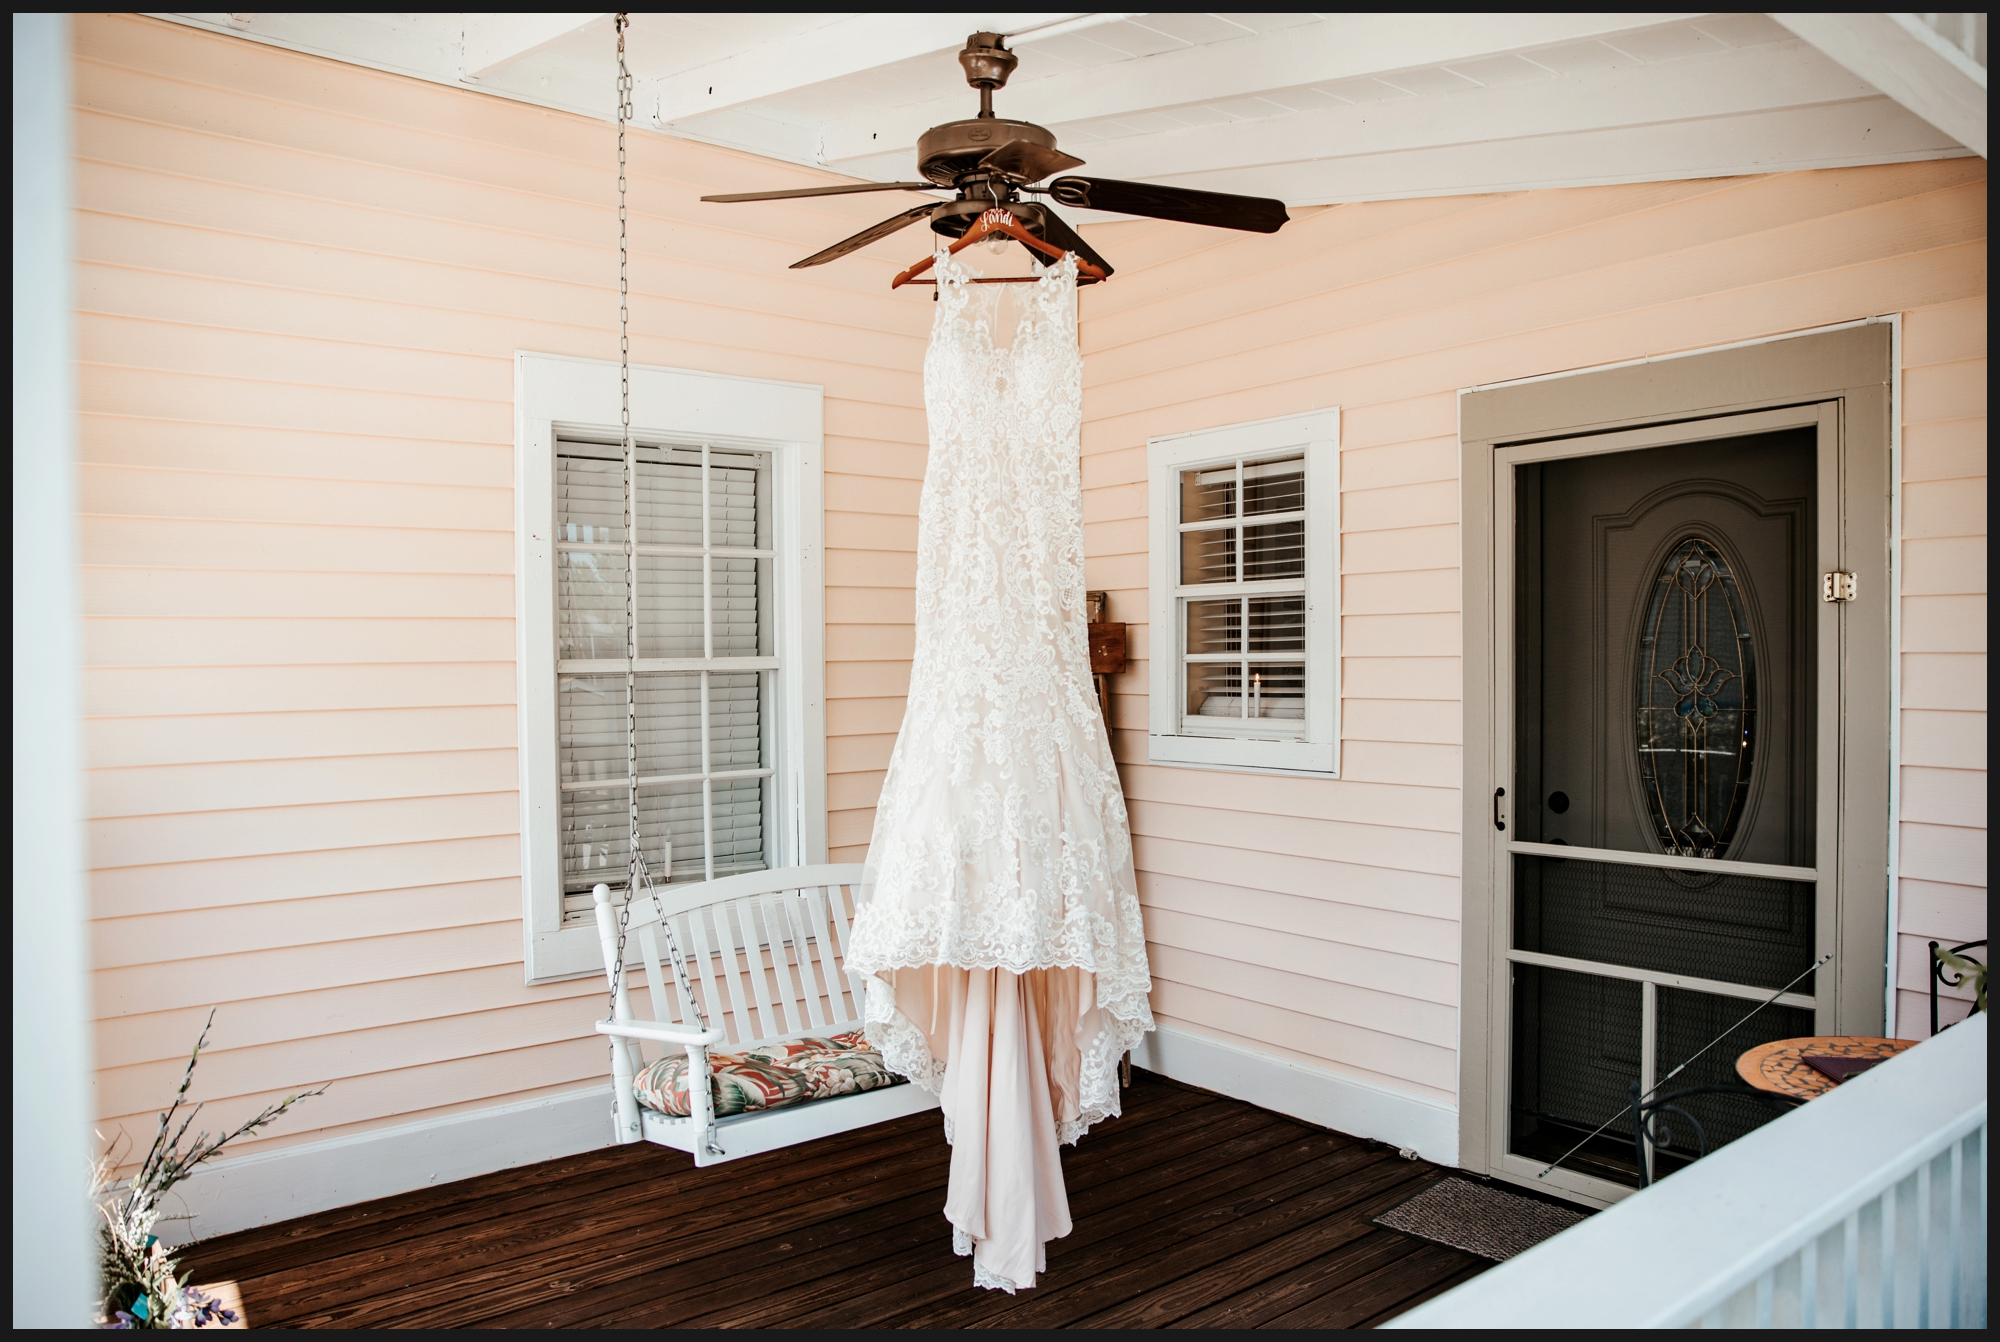 Orlando-Wedding-Photographer-destination-wedding-photographer-florida-wedding-photographer-hawaii-wedding-photographer_0557.jpg